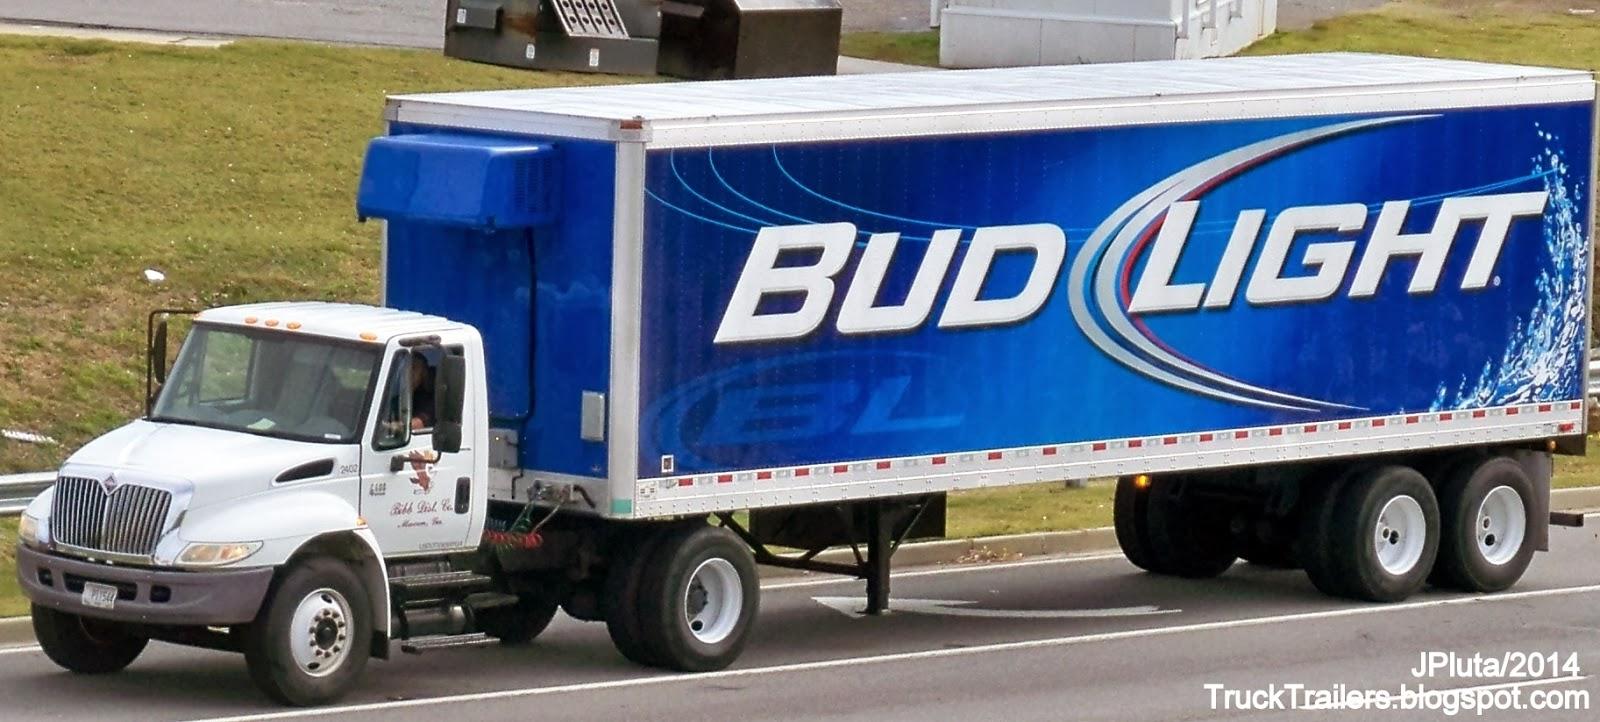 Awesome BIBB DISTRIBUTING Company Macon Georgia International 6400 Day Cab Truck  2503, BUD LIGHT Beer 9 Bay Side Door Trailer Bibb County Macon GA. Budweiser Good Ideas